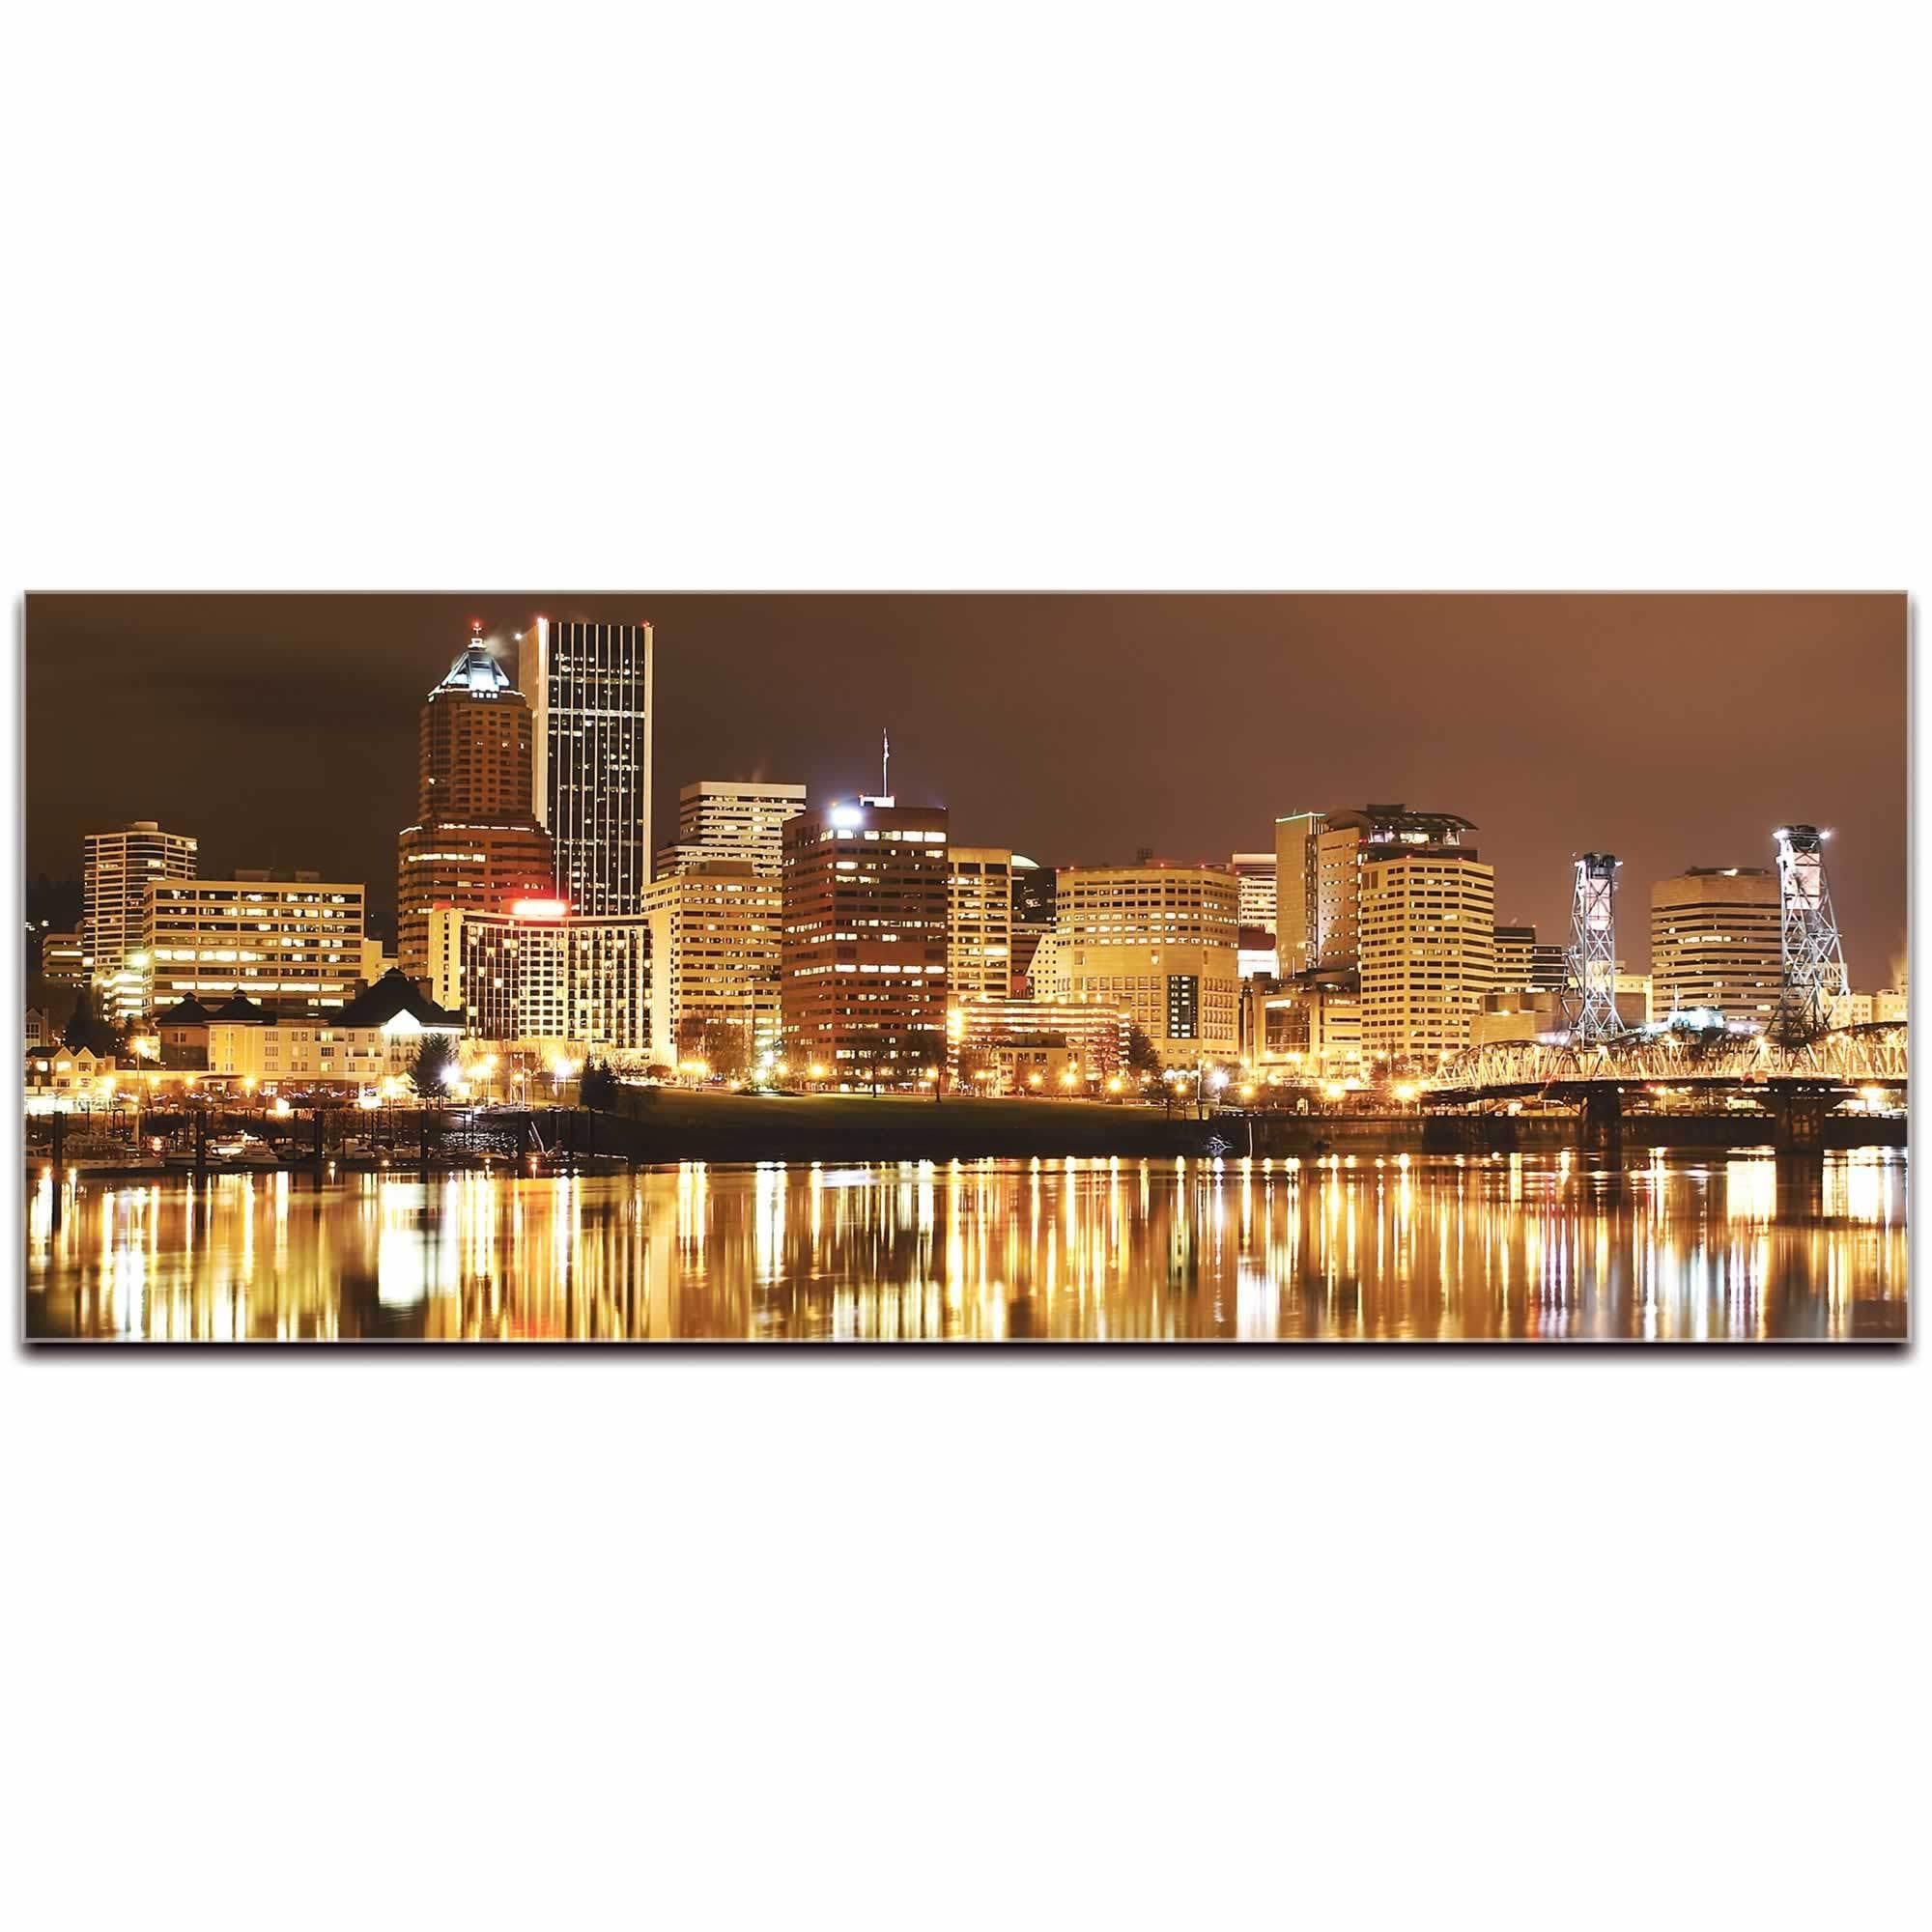 Modern Crowd 'Portland City Skyline' Urban Cityscape Enha...